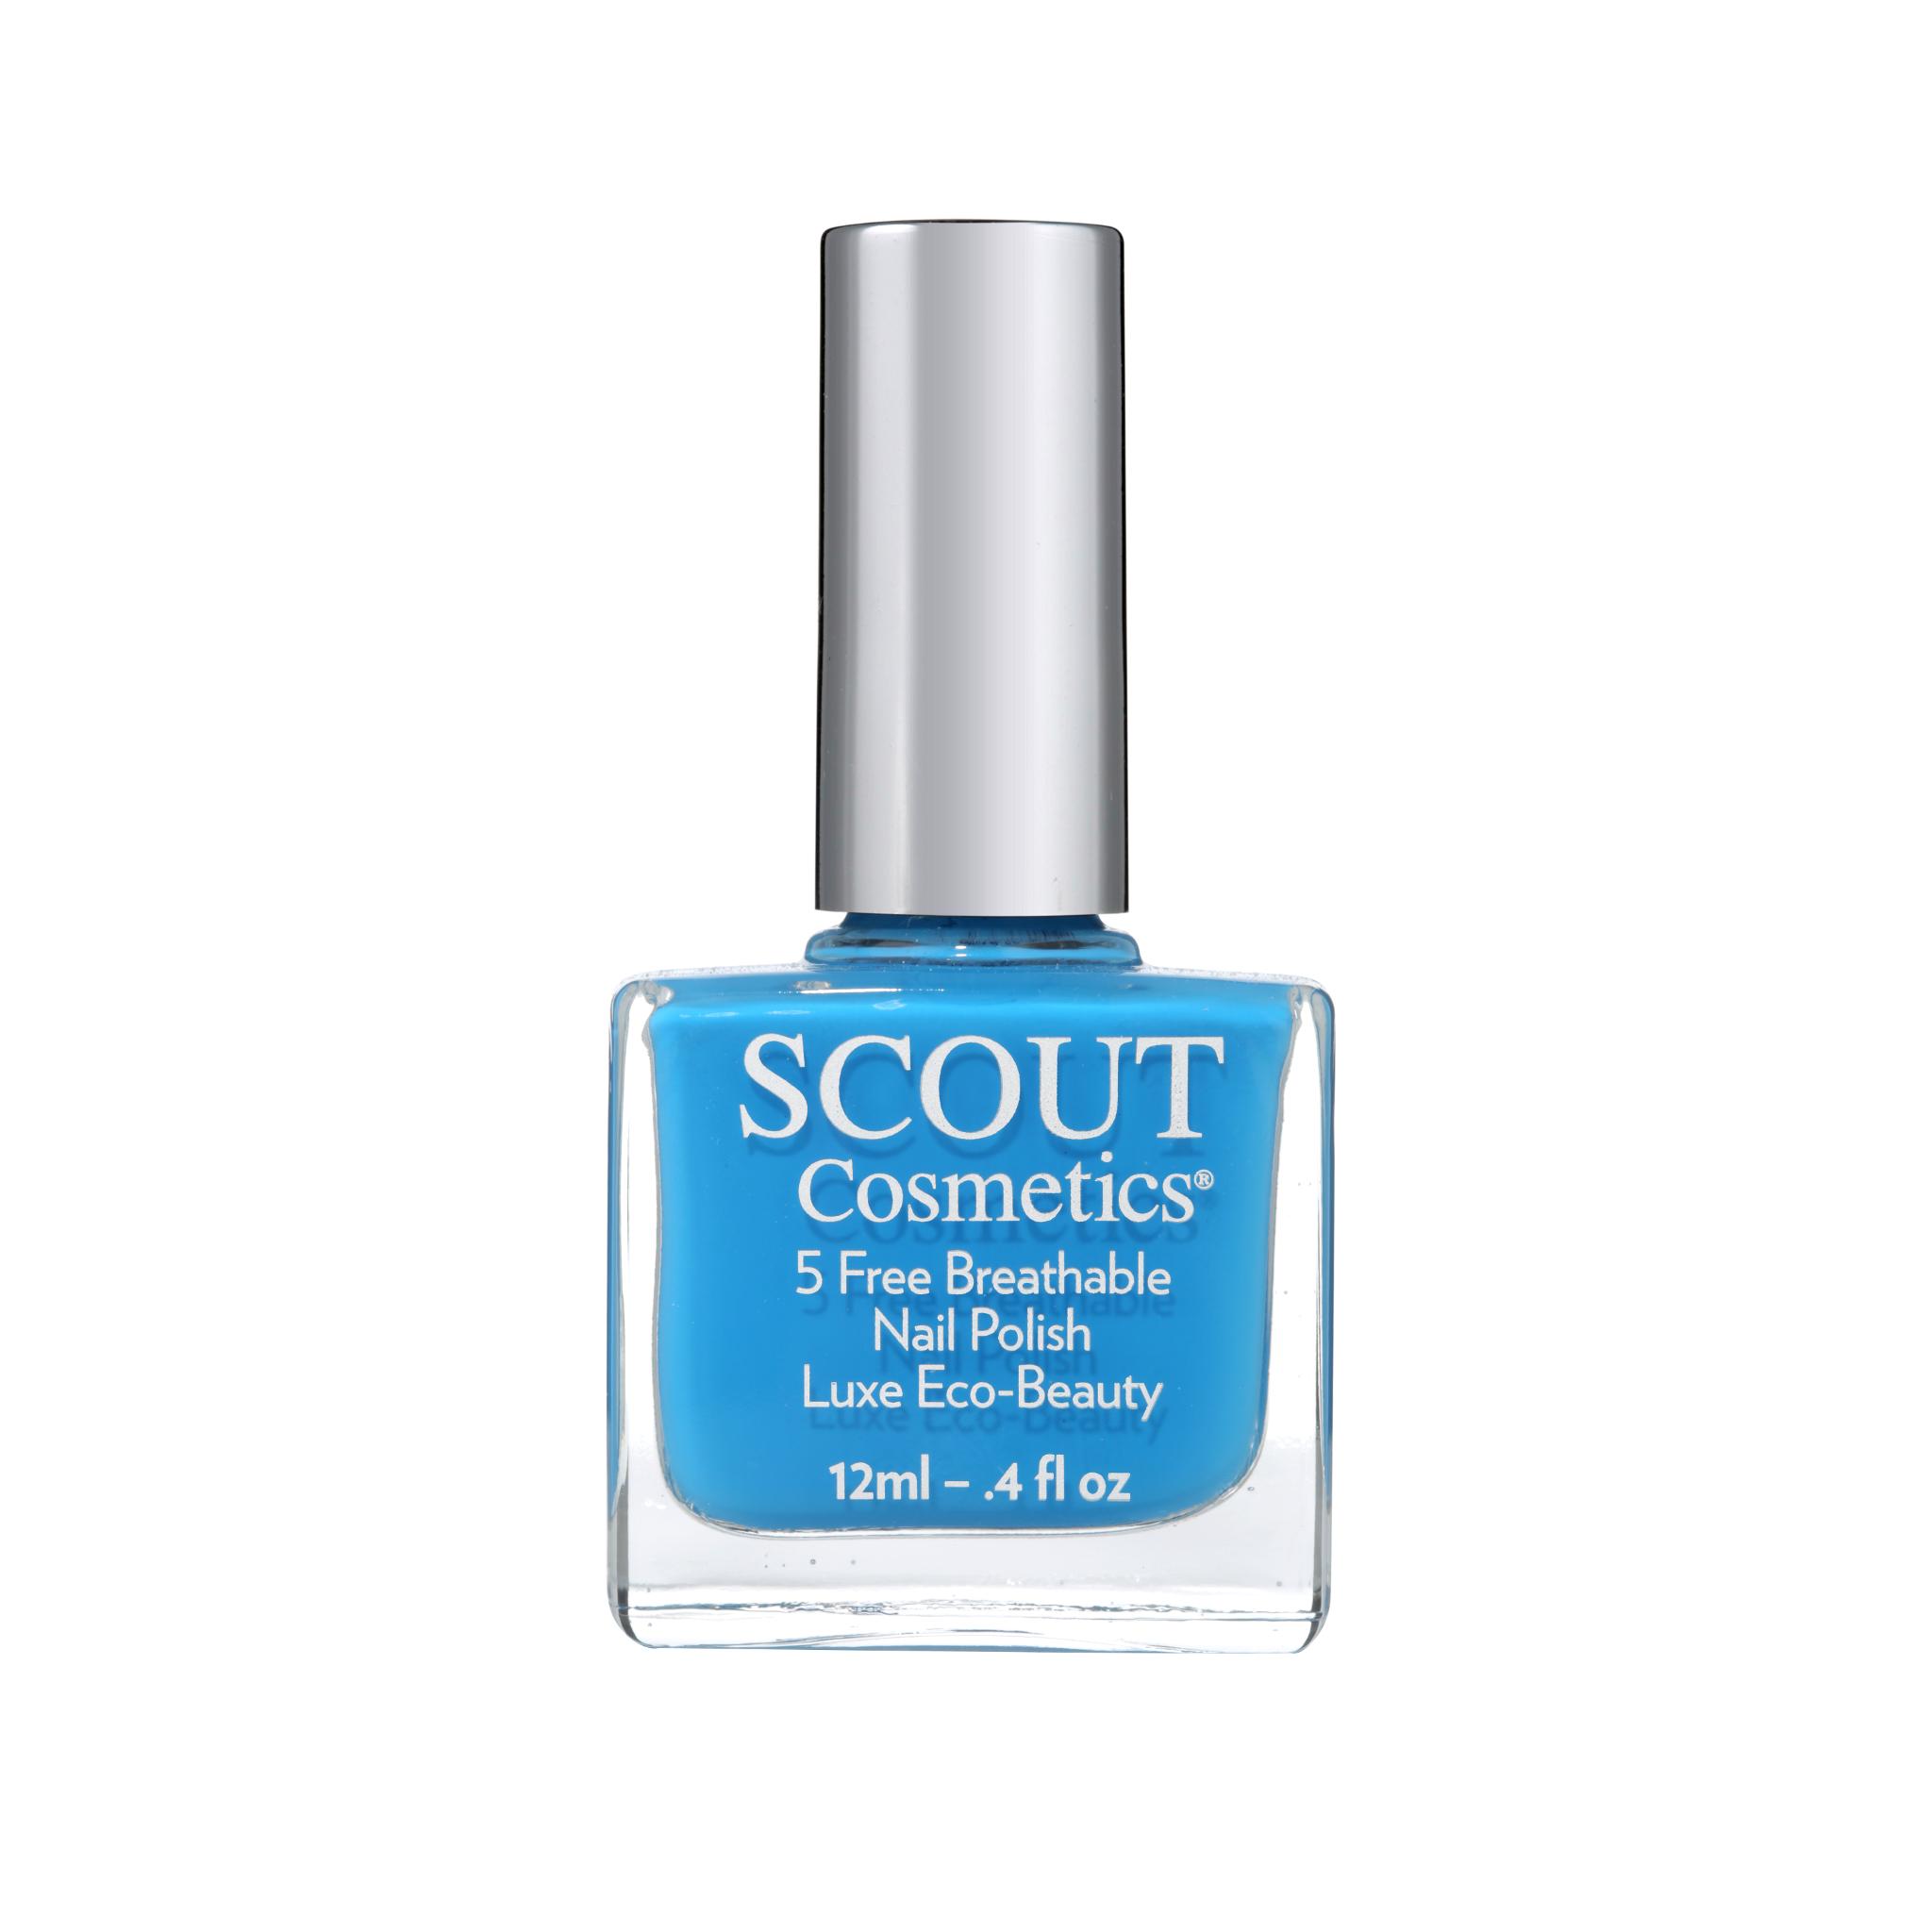 SCOUT Cosmetics Nail Polish - Fancy SCO007   Hardy\'s   New Zealand